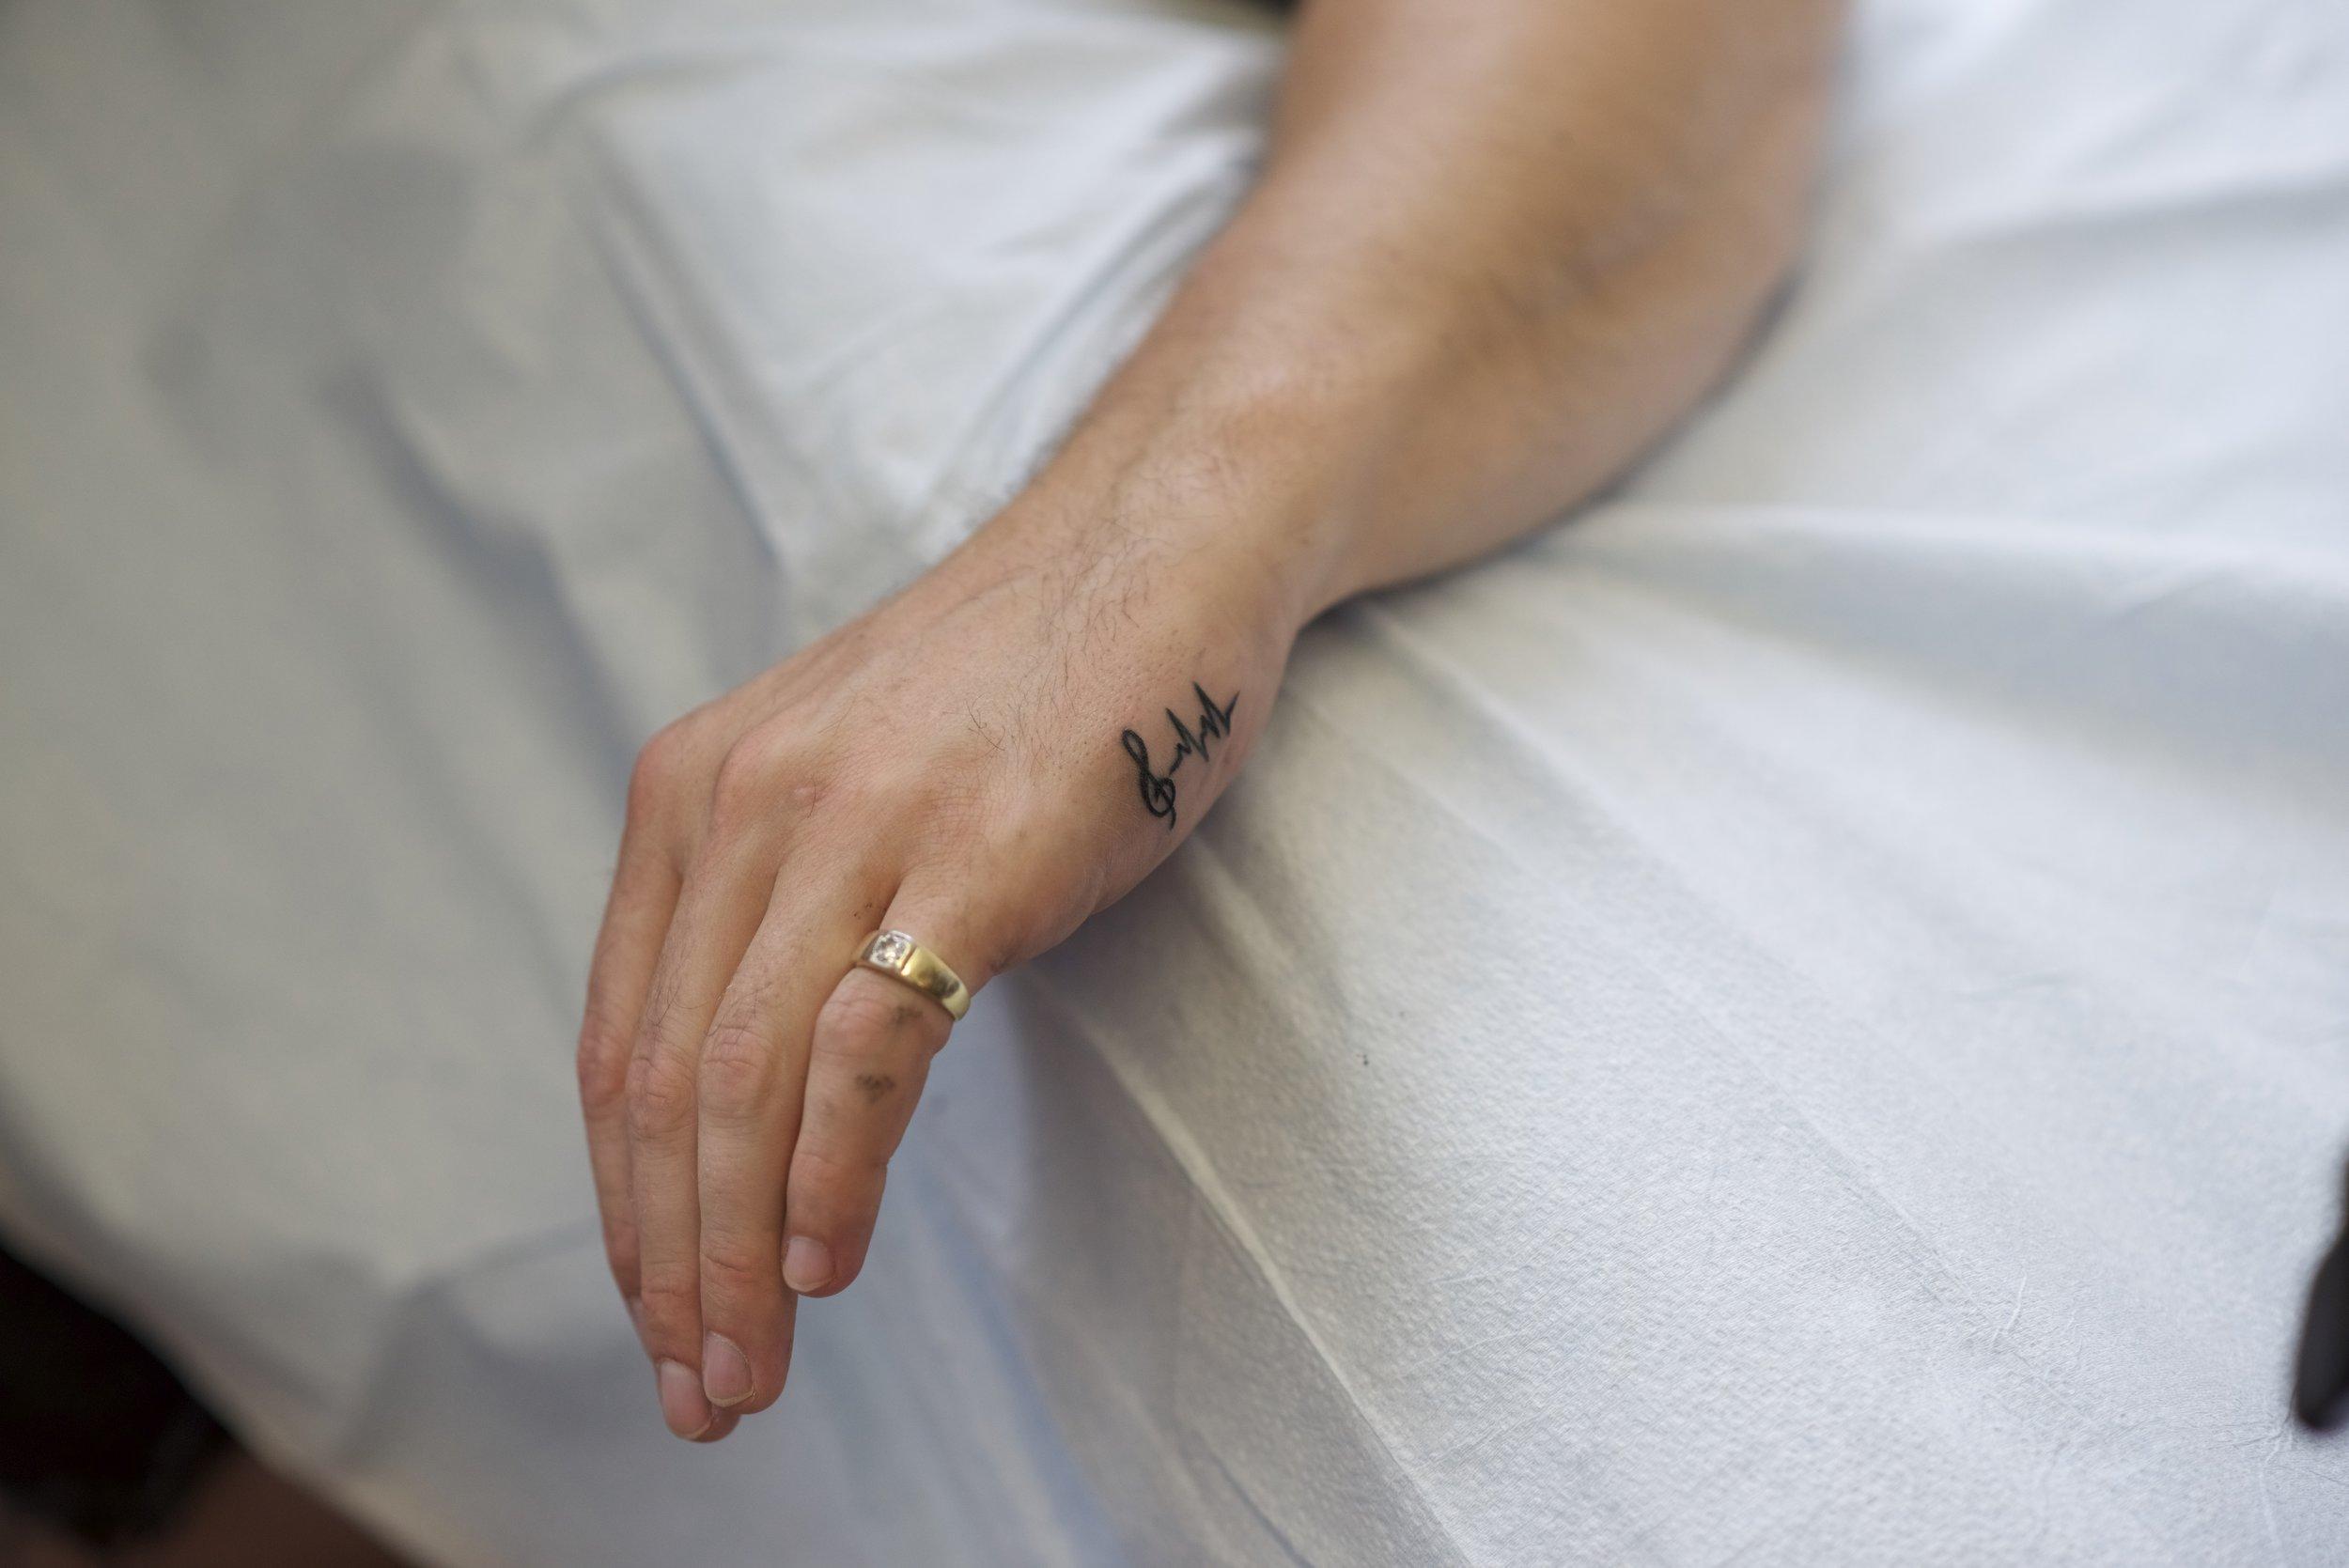 Tattoo by  Alveno